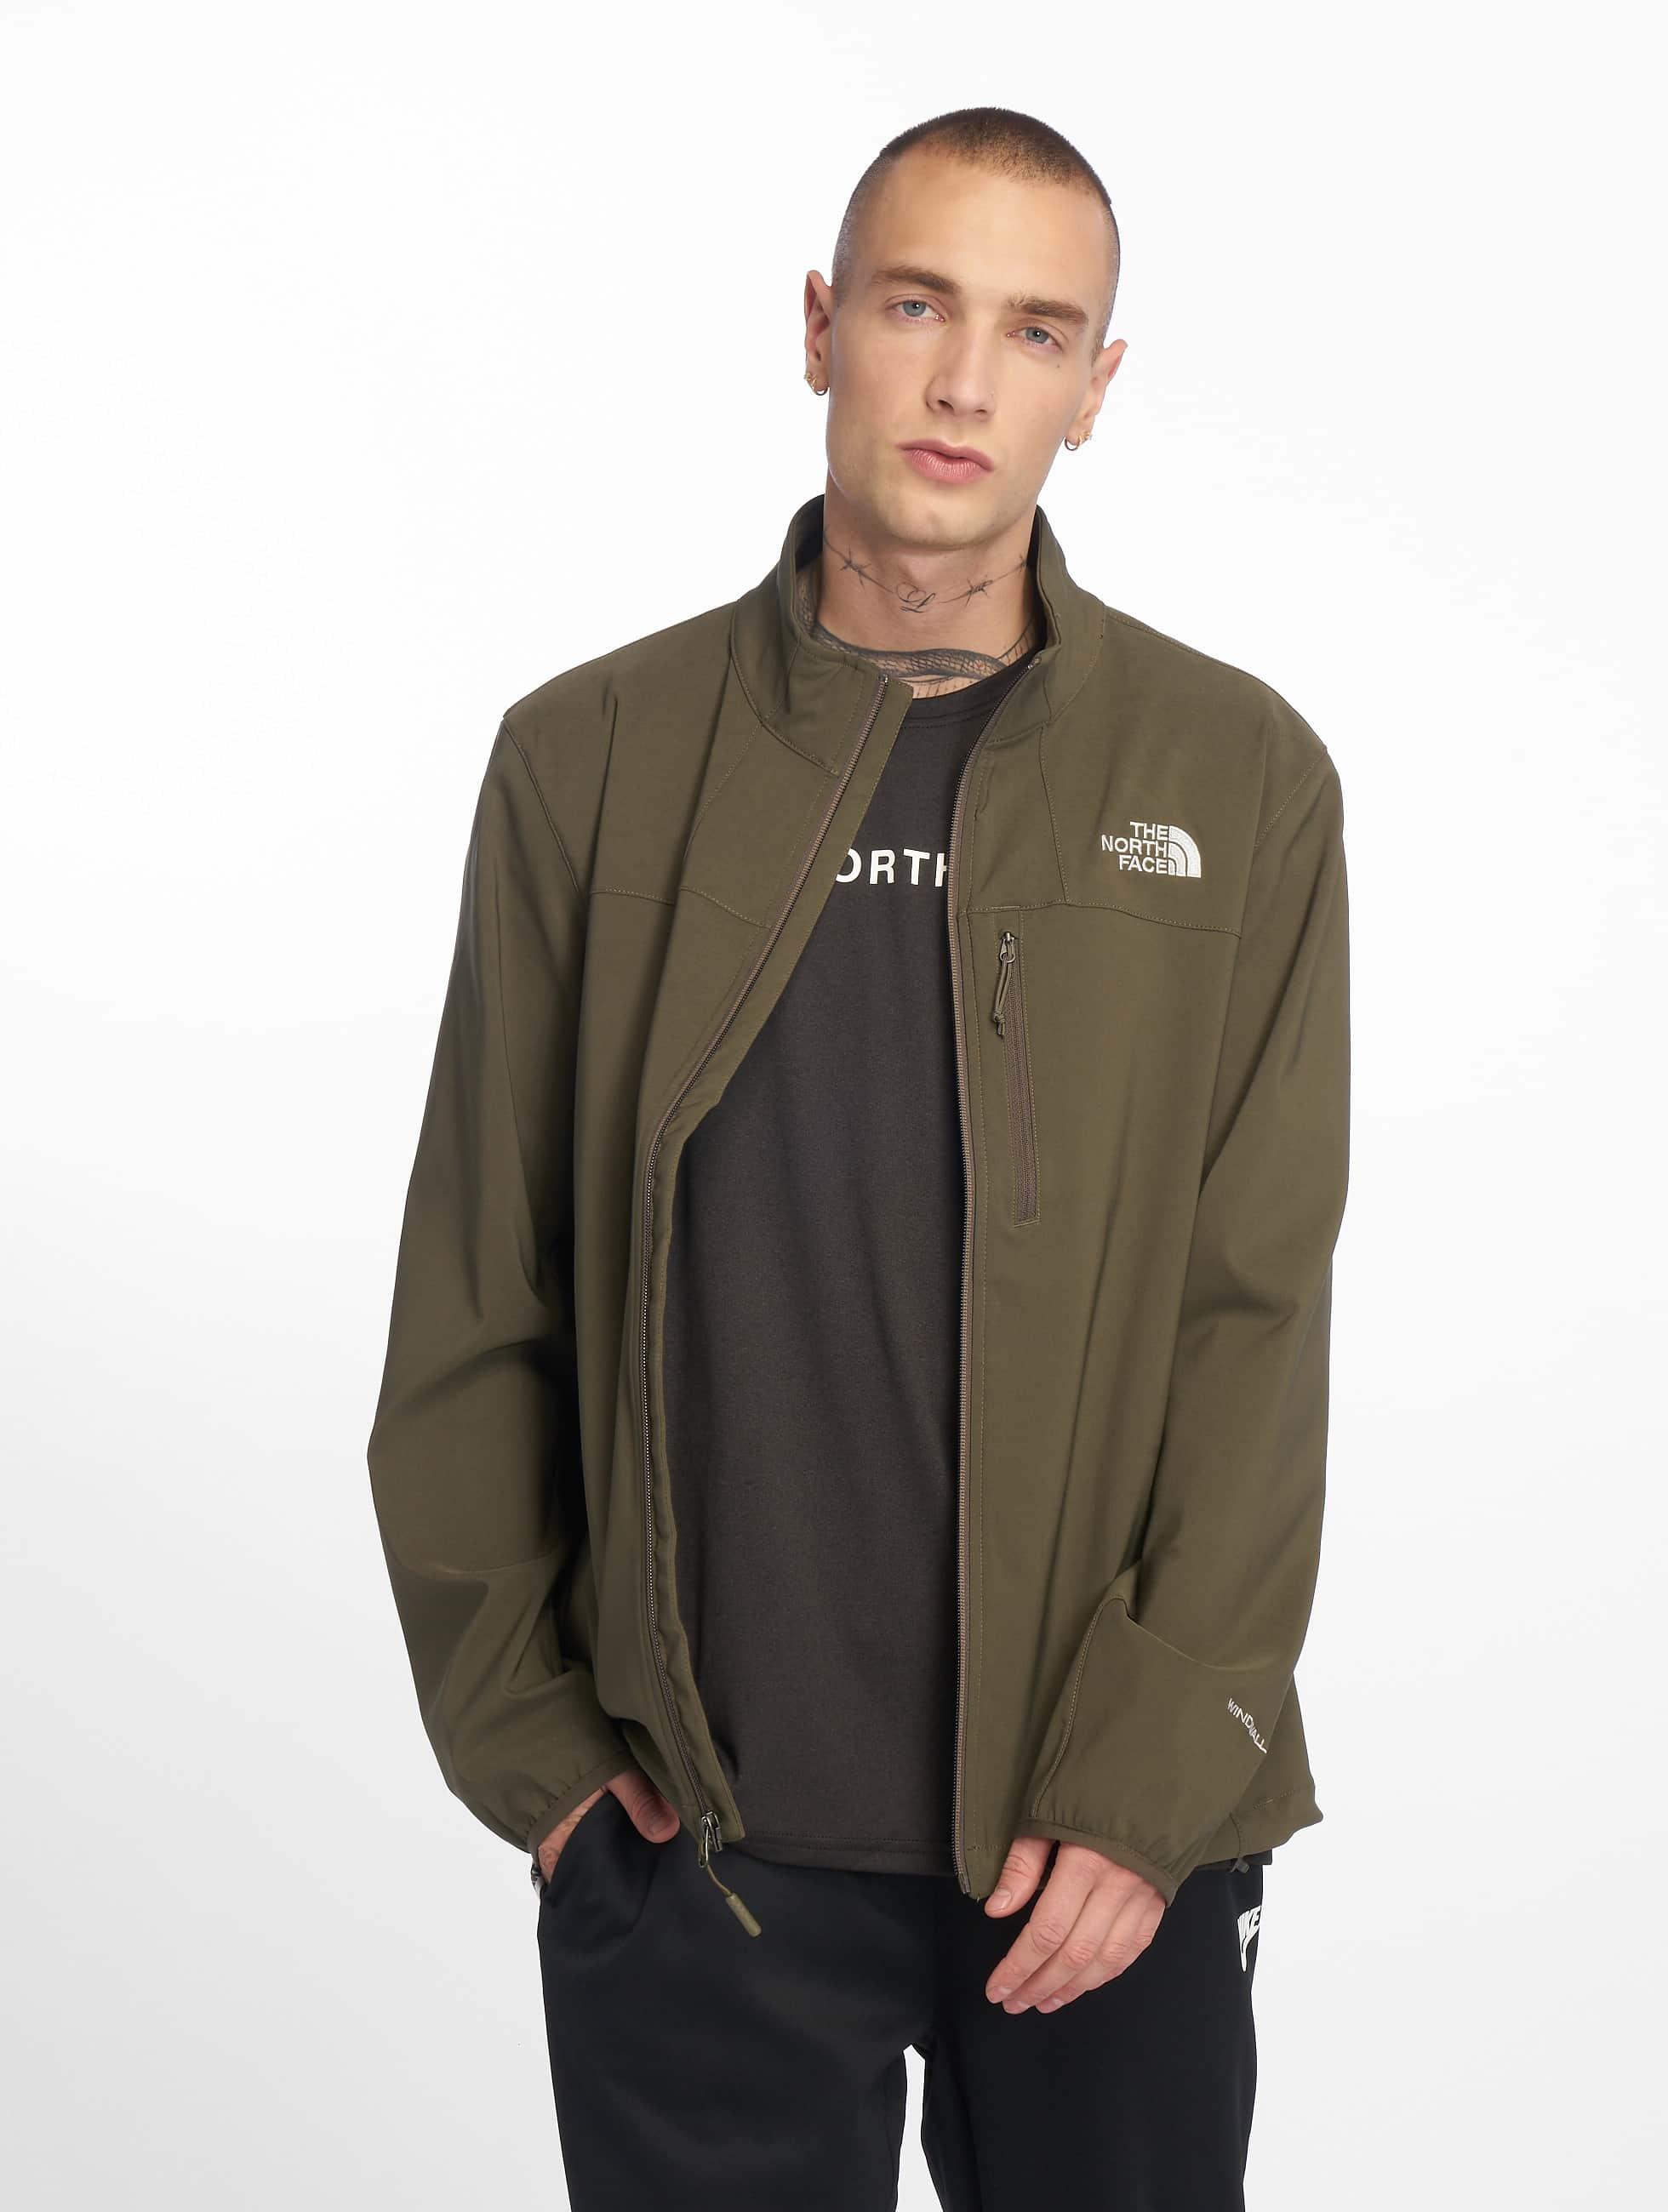 Jacket Nimble The North Face New Green Taupe lK1J3TcF